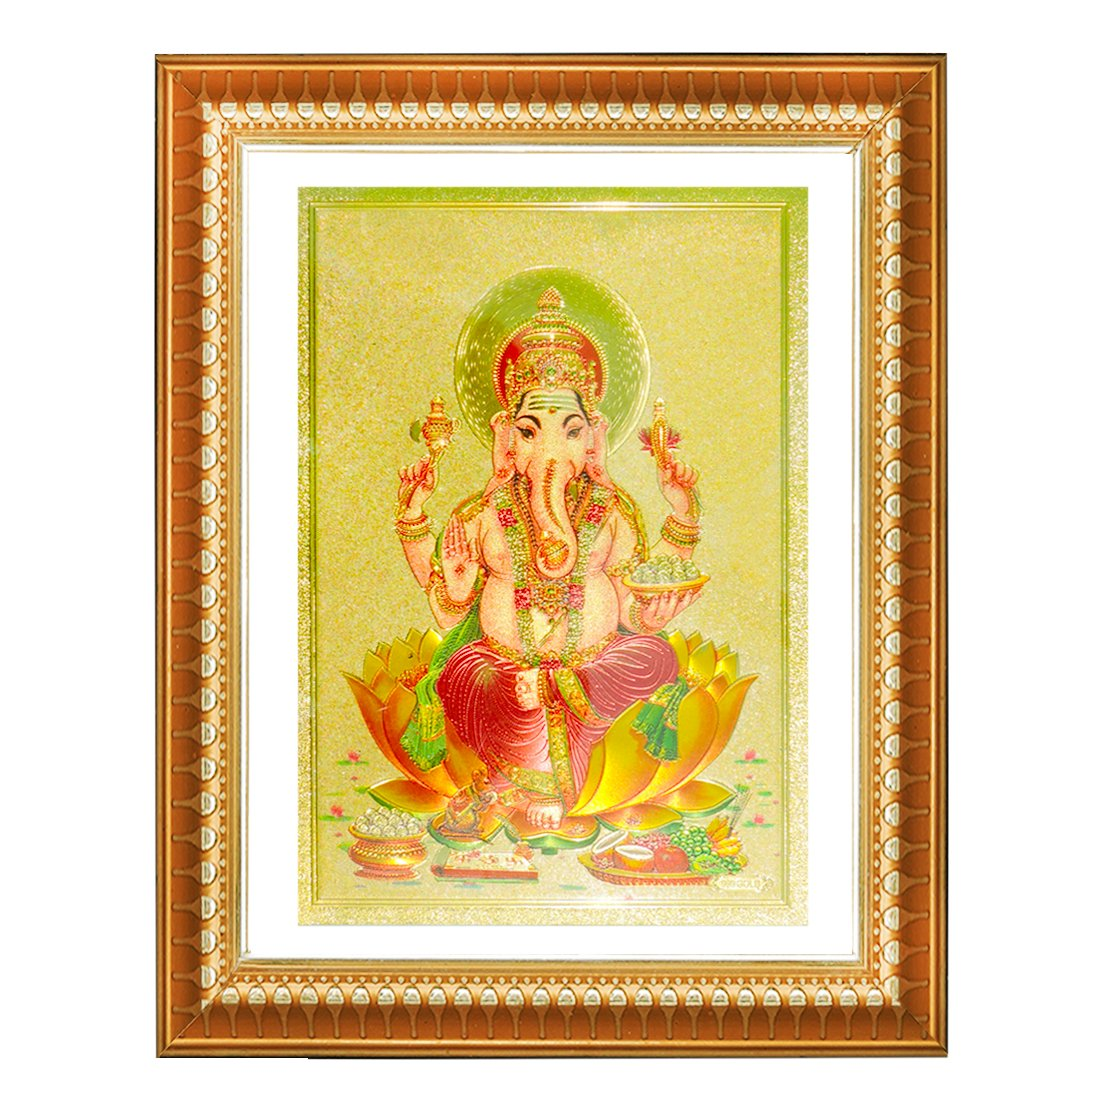 Drei Juwelen (Jainismus) Lord Ganesha Rahmen Wand/Tür Aufhängen ...